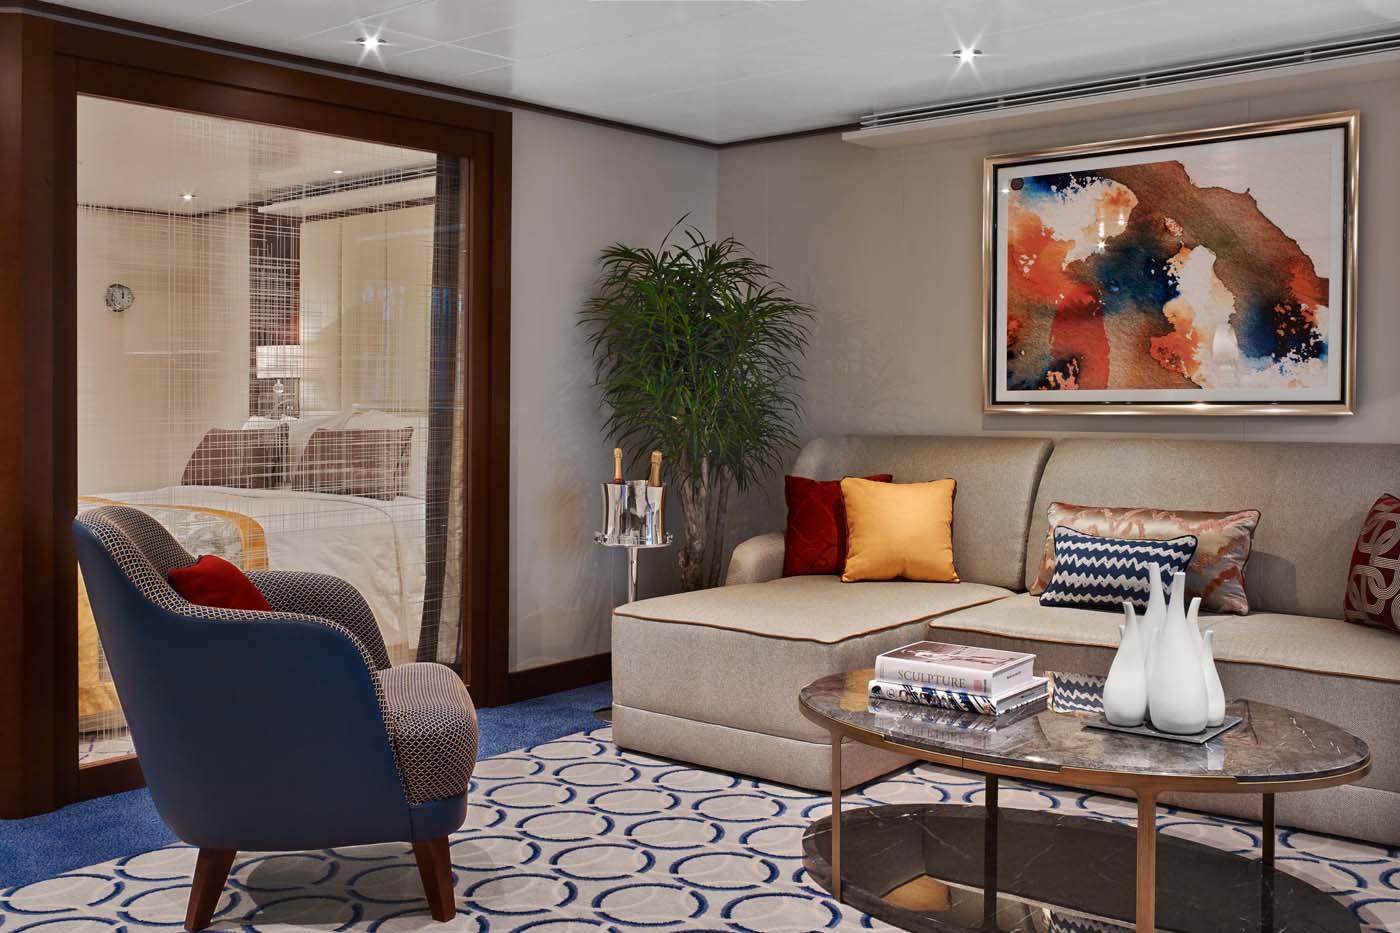 Penthouse Suite PH - Seabourn Encore - Bild 2 - Thumb